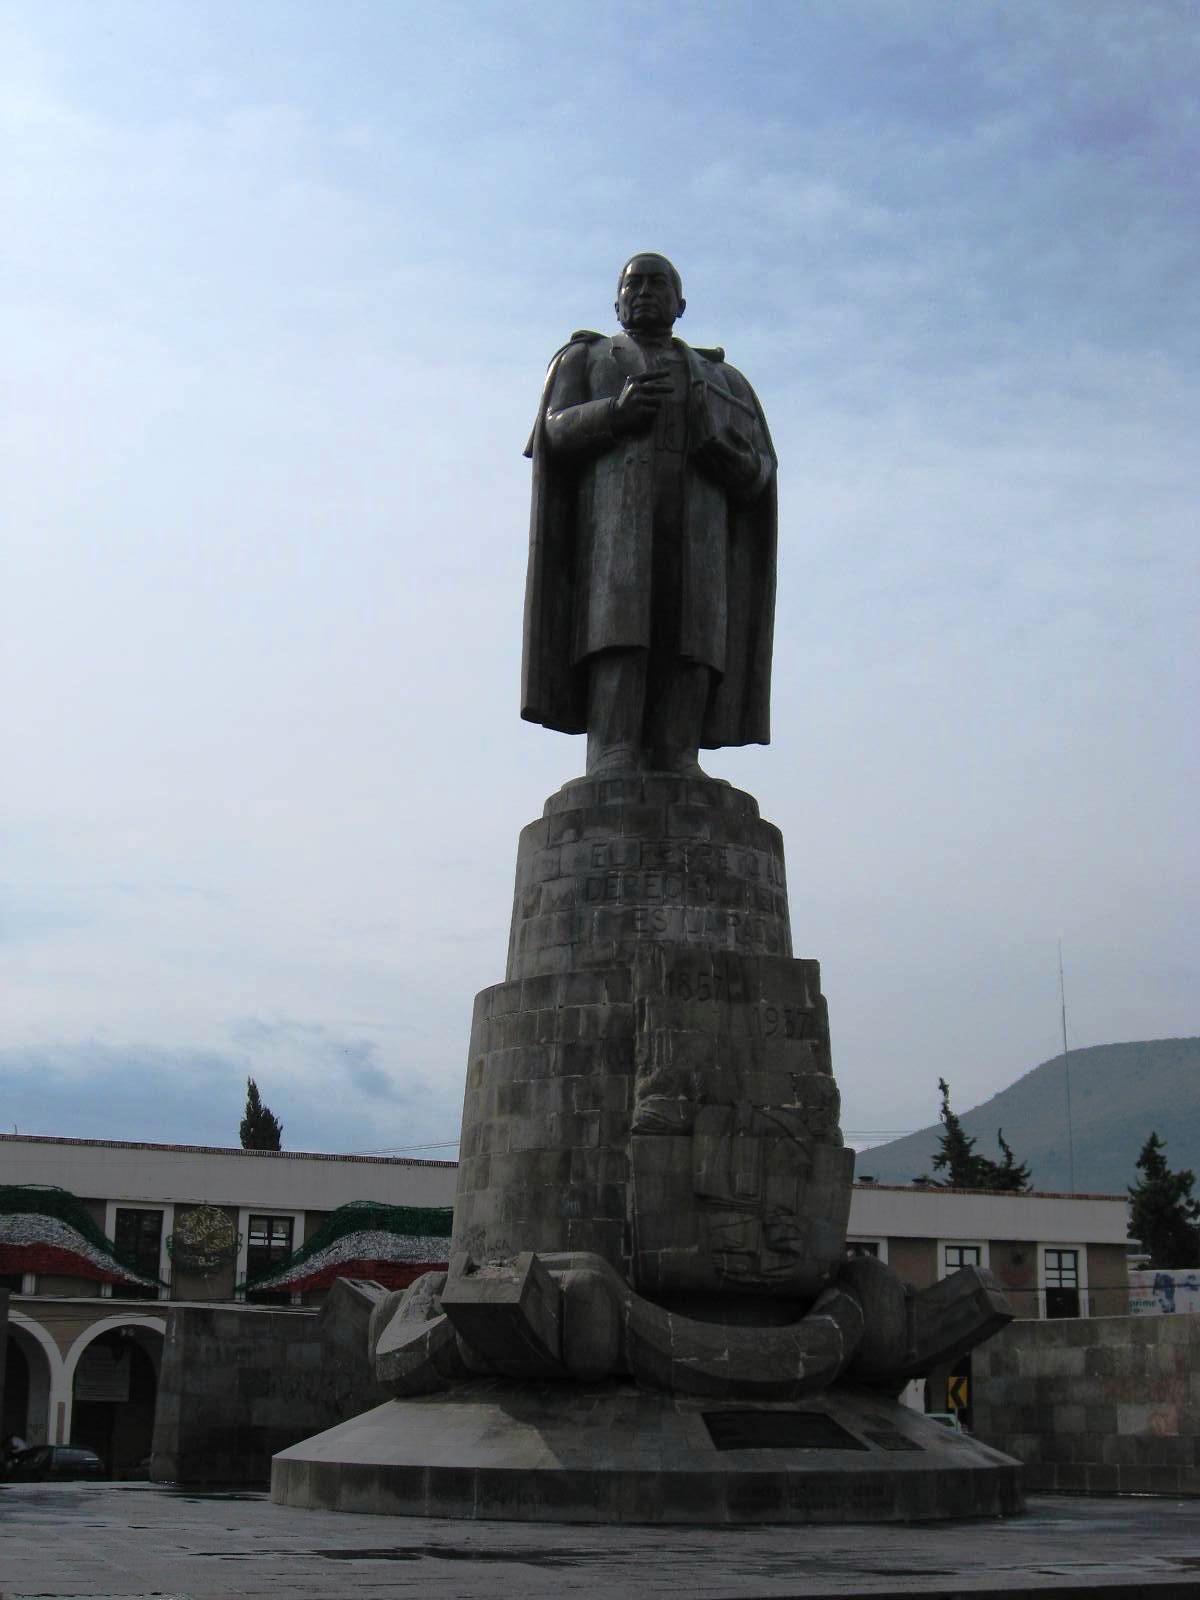 Monumento a benito ju rez en pachuca hidalgo 101b for Benito juarez mural